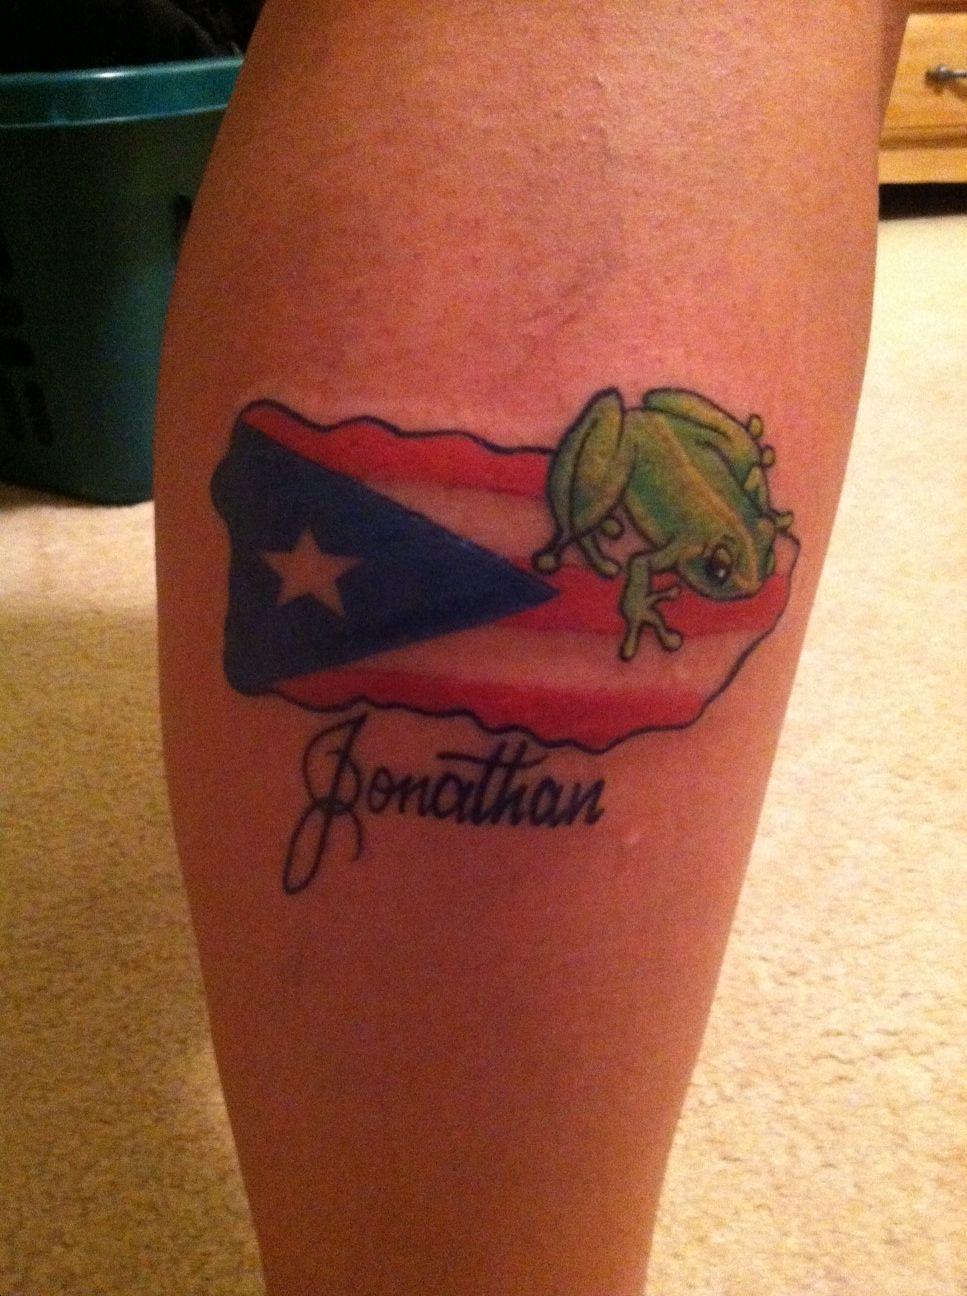 Puerto rican flag tattoo tat pinterest flag tattoos for Puerto rican tattoo